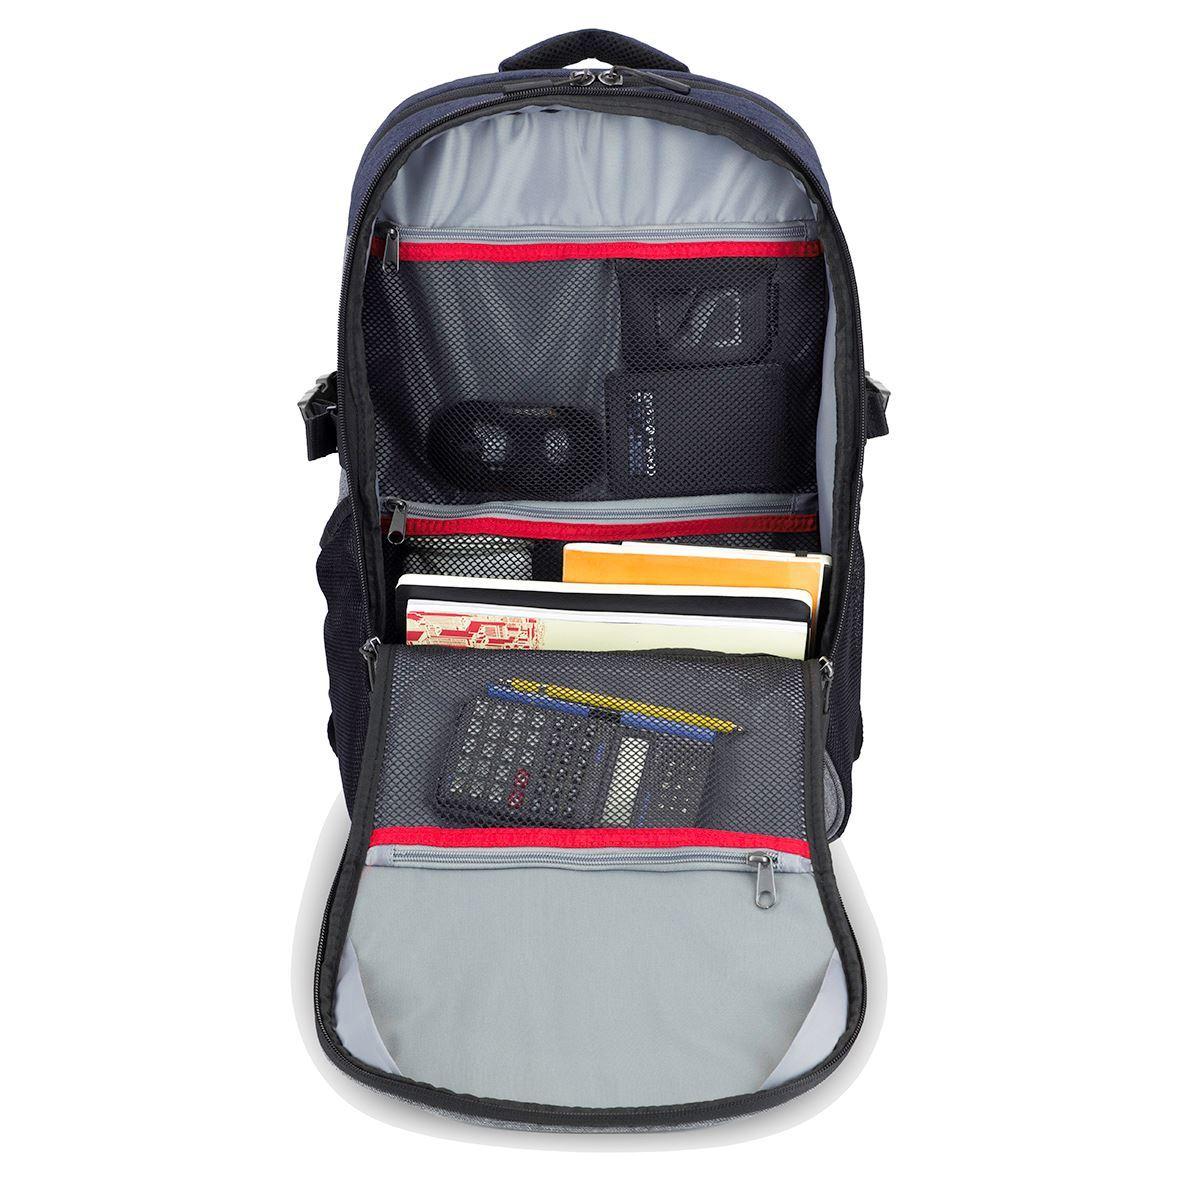 Urban Explorer 15 6 Quot Laptop Backpack Blue